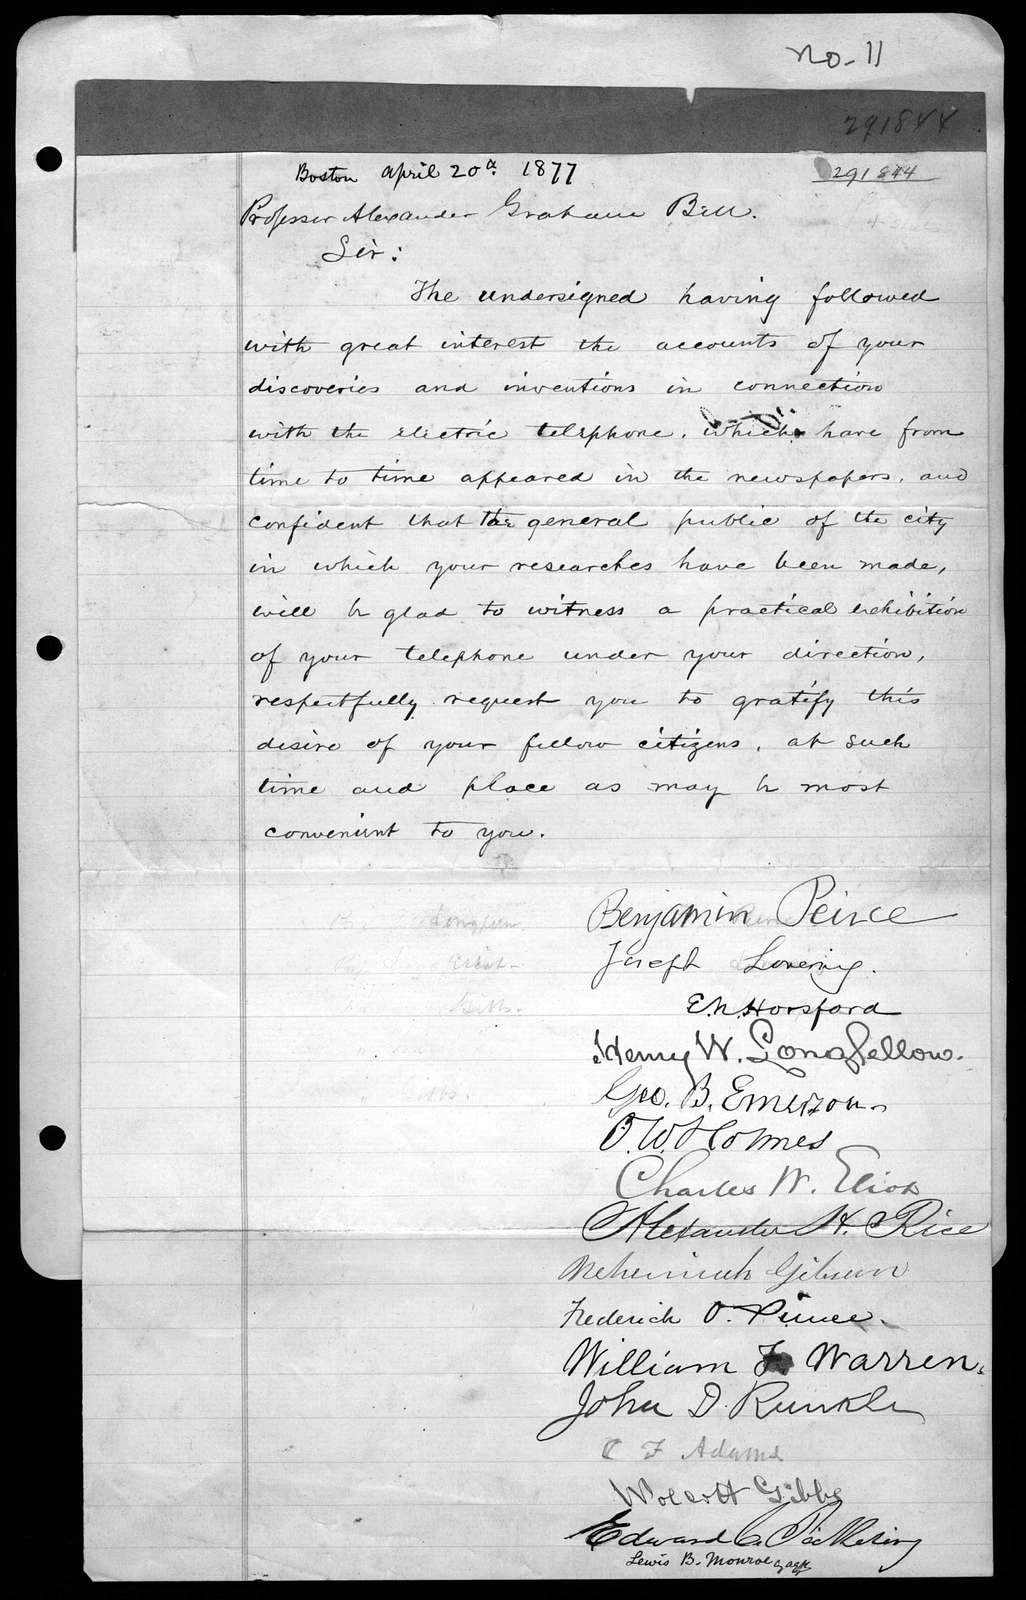 Letter from Benjamin Peirce to Alexander Graham Bell, April 20, 1877